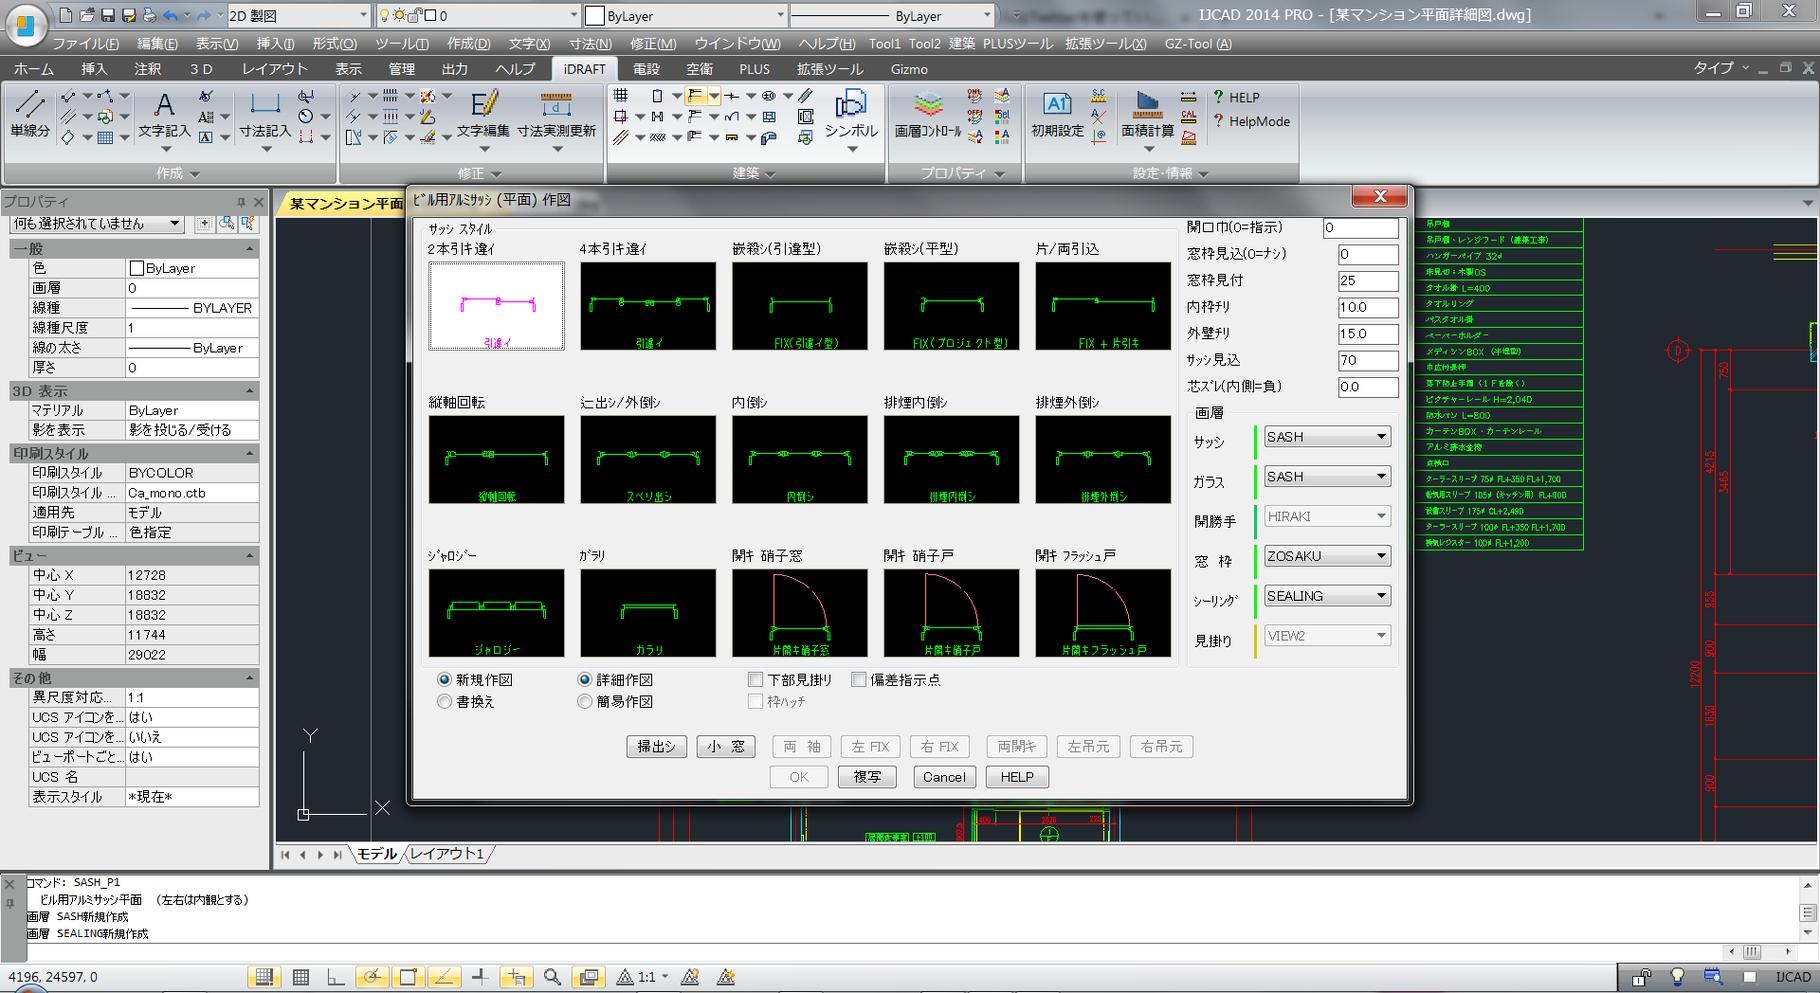 RC、S、SRCや木造(在来、2x4)など建築構造に応じた機能を搭載。